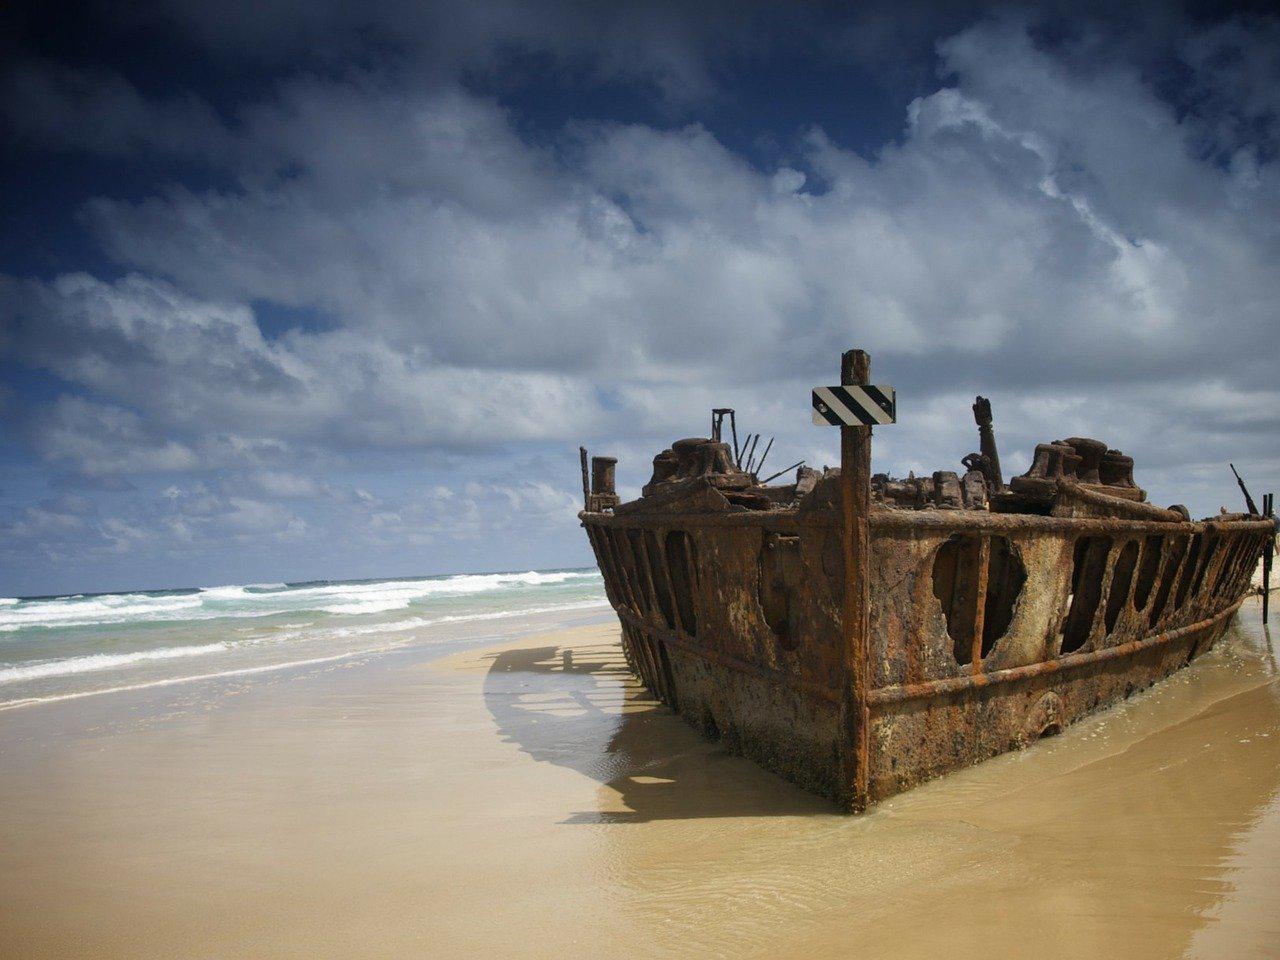 Shipwreck Australia